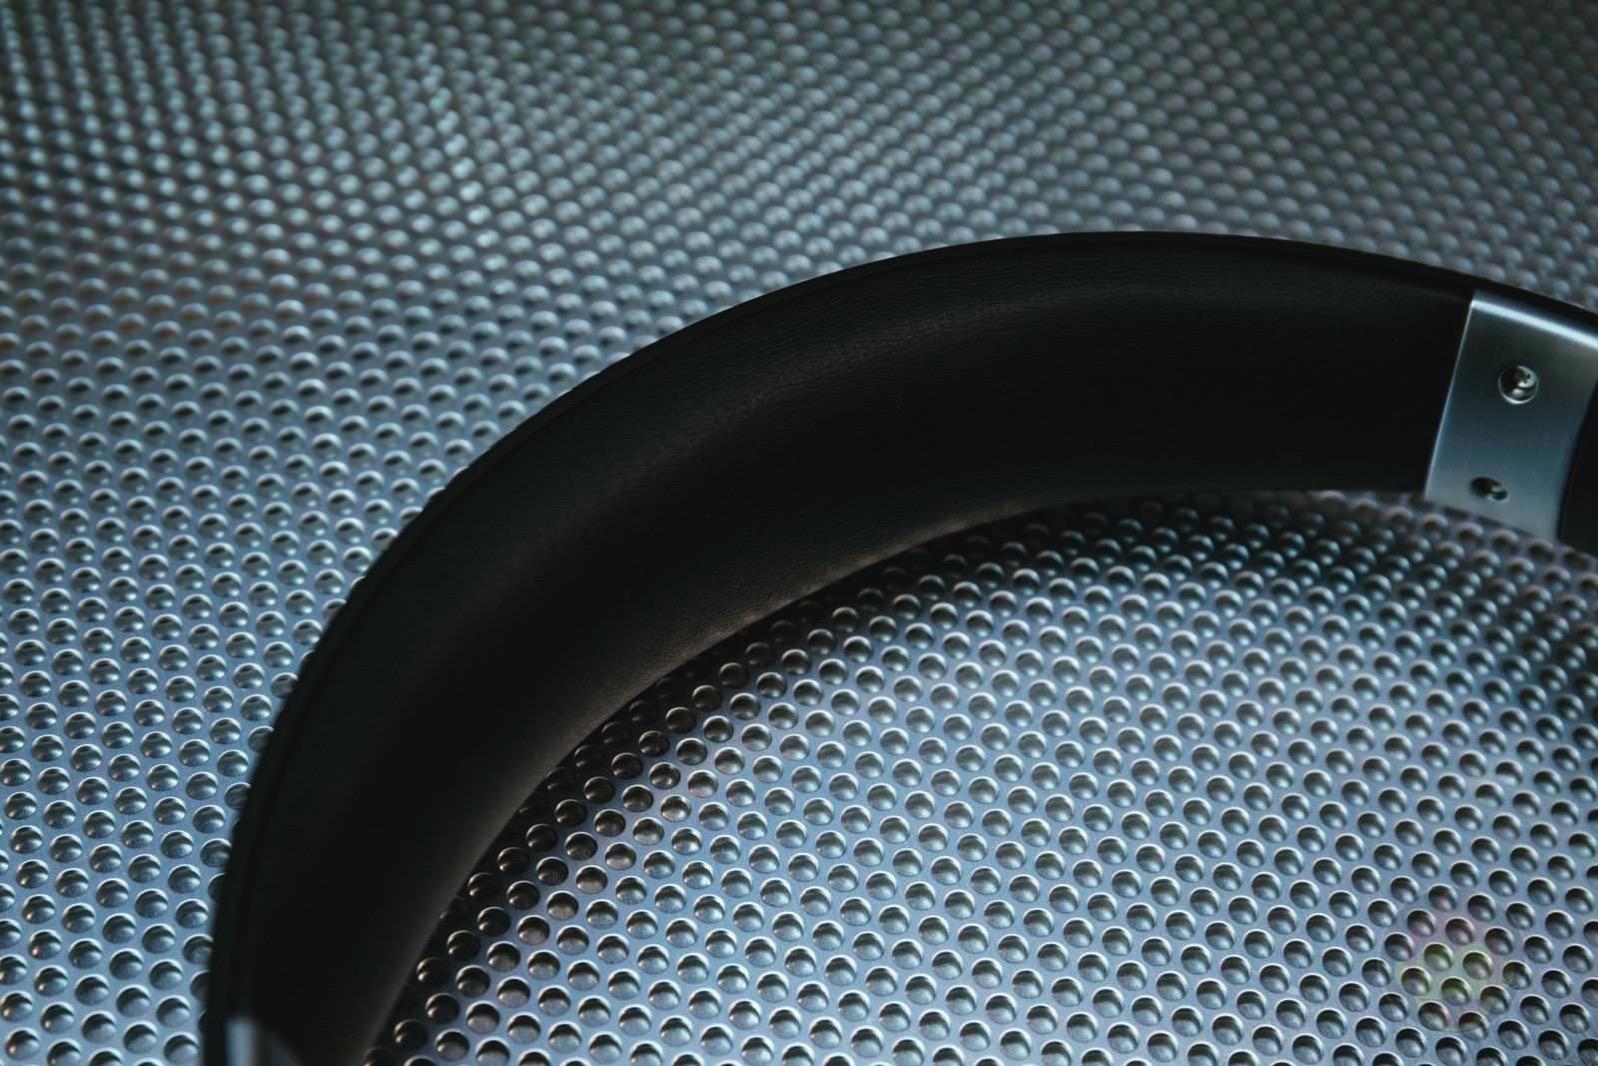 Soundcore-Vortex-Wireless-Headphones-09.jpg